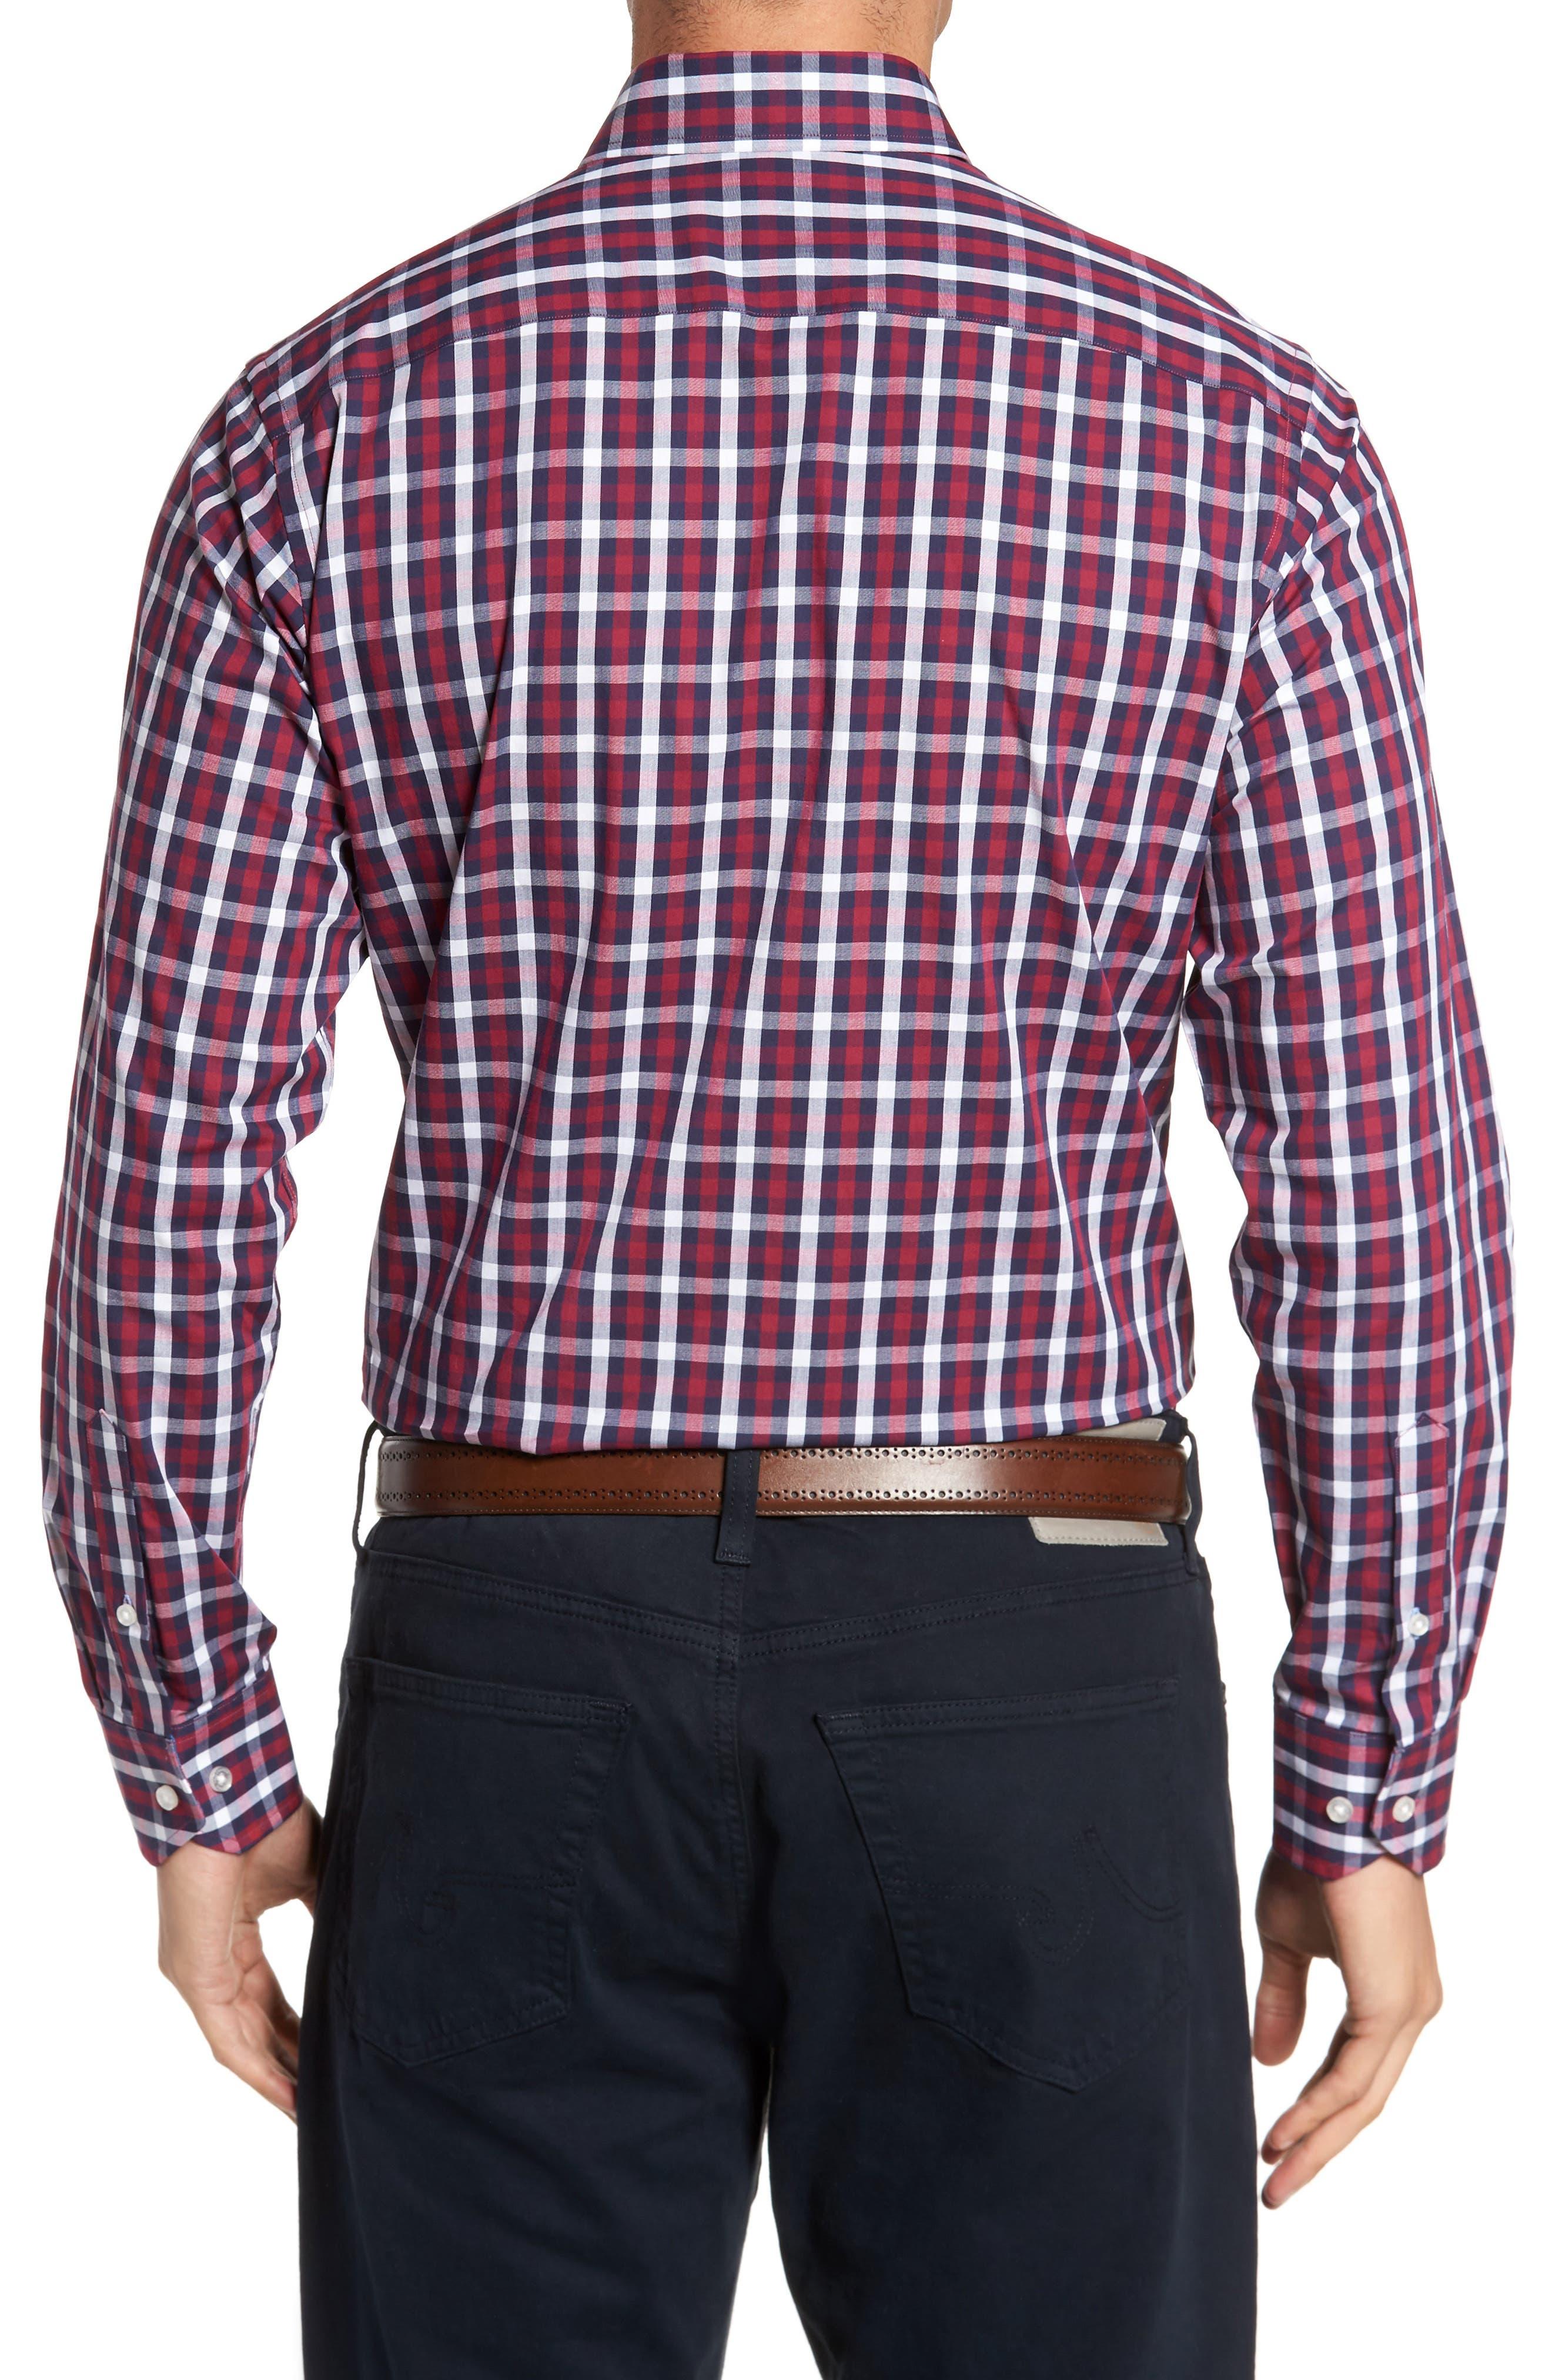 Alternate Image 2  - TailorByrd Covington Check Sport Shirt